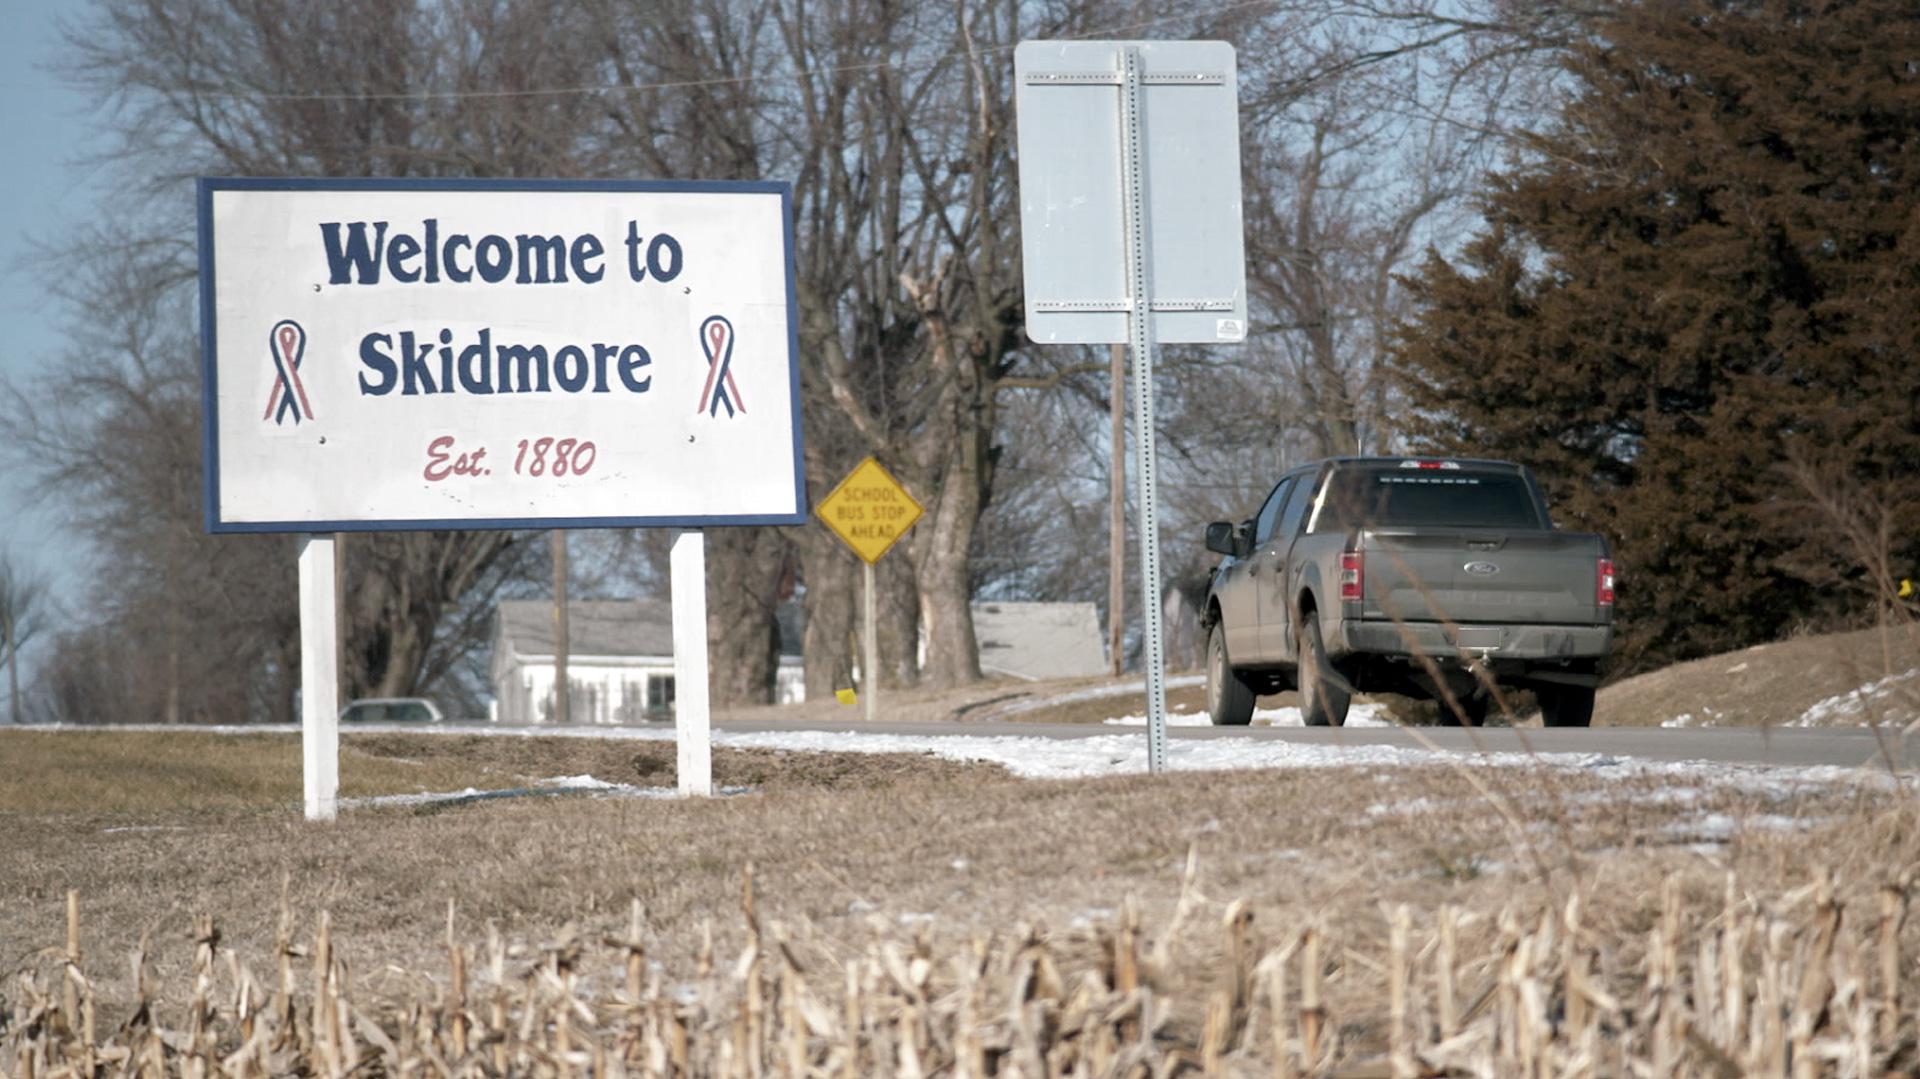 Skidmore roadsign